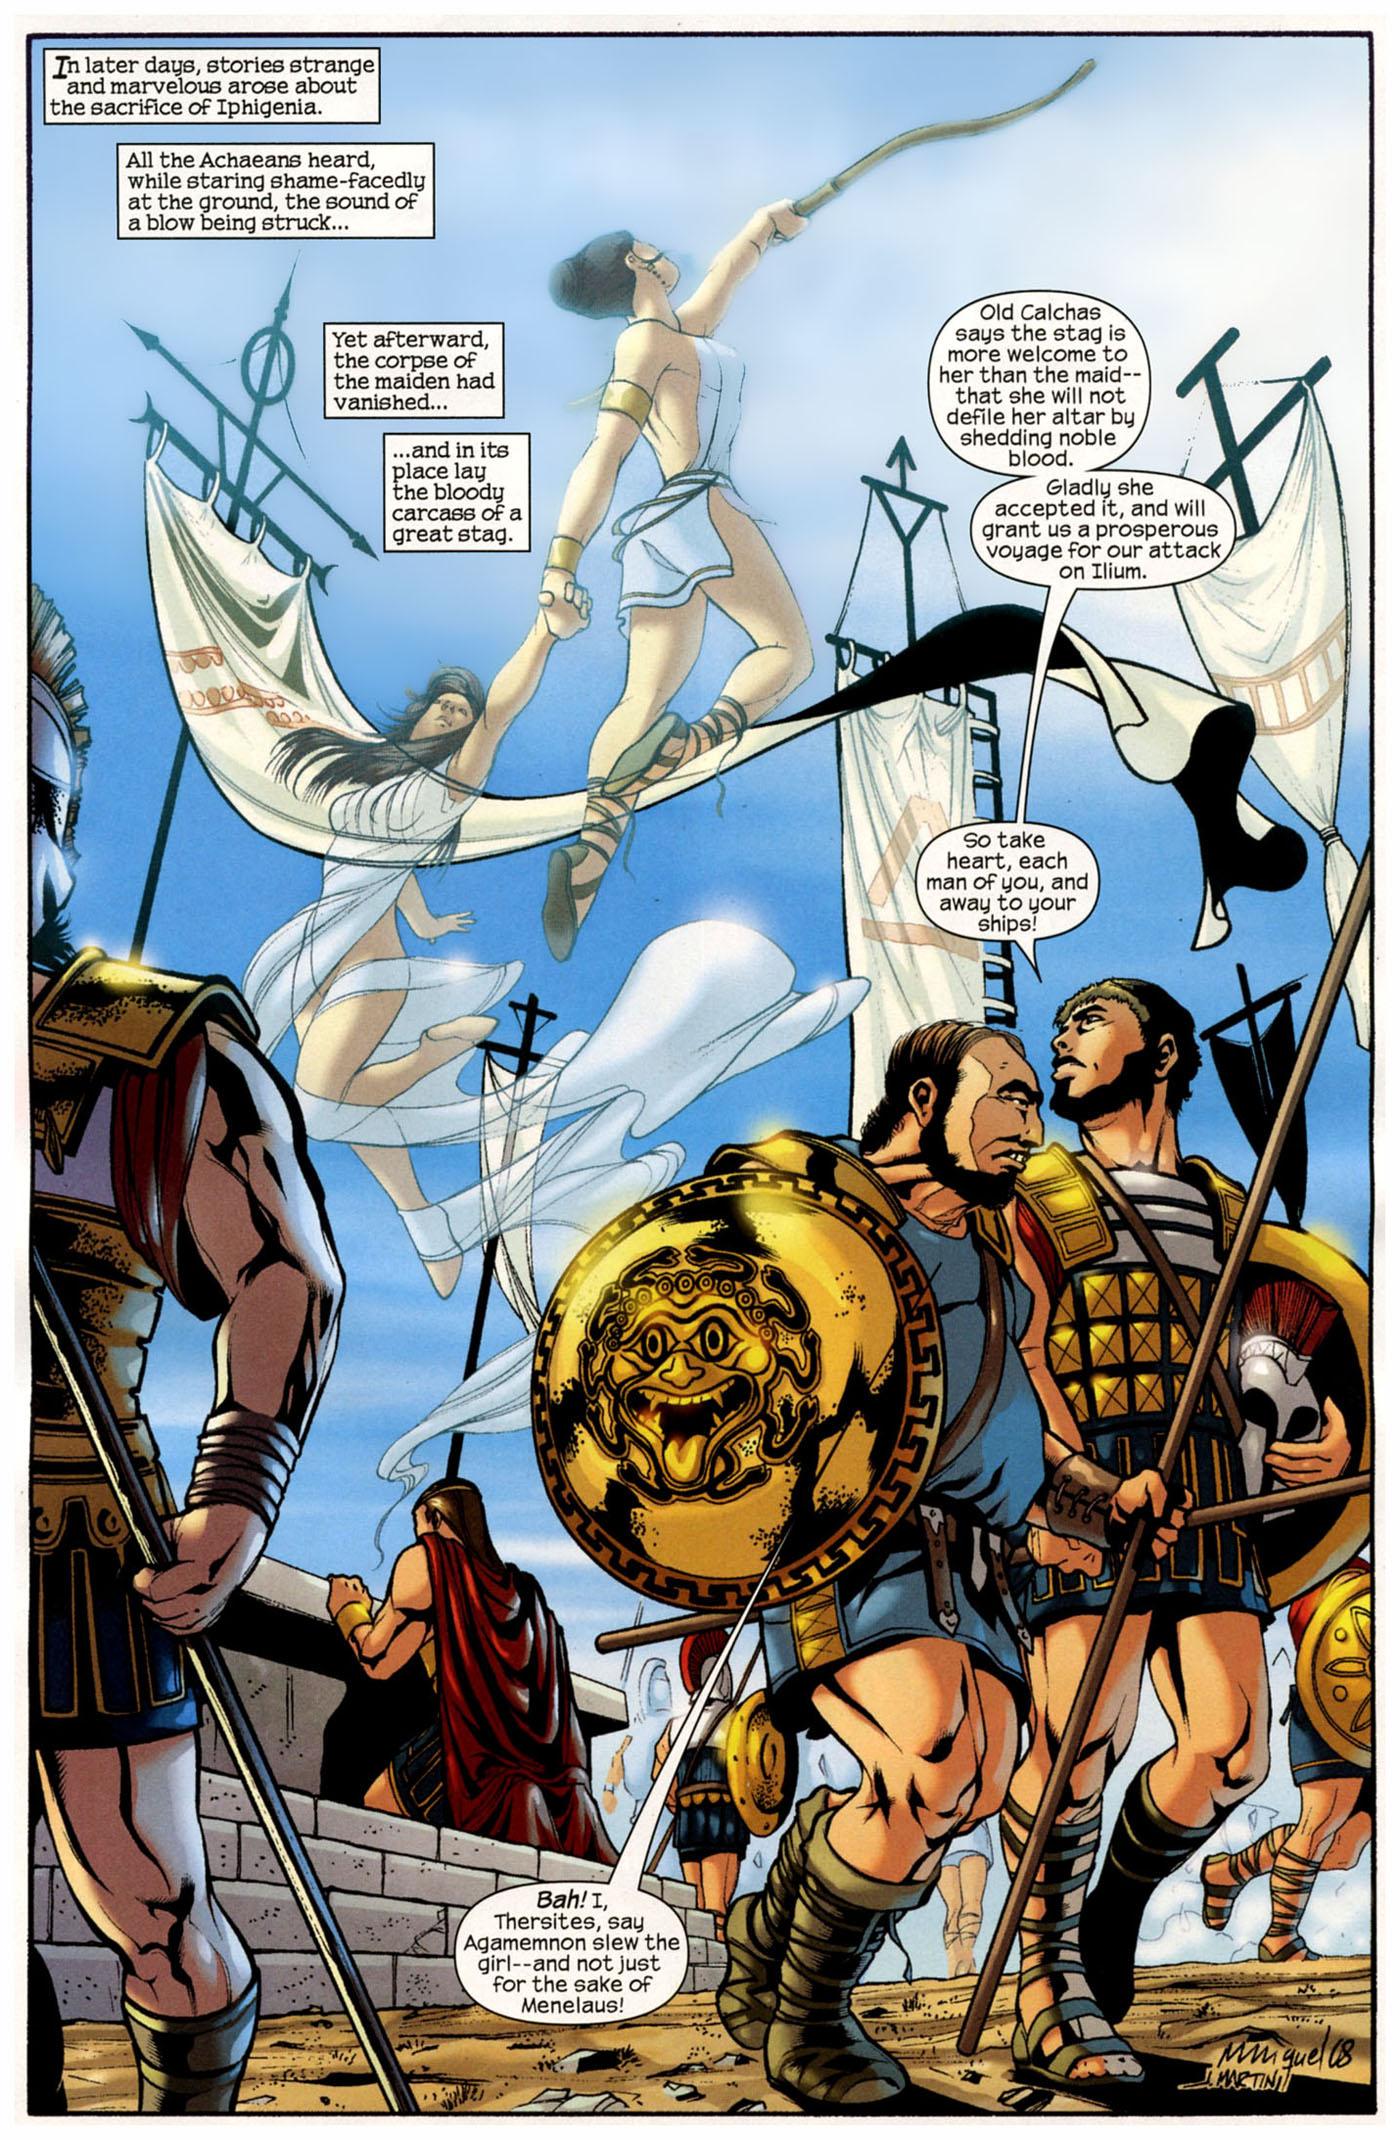 Read online Trojan War comic -  Issue #2 - 9